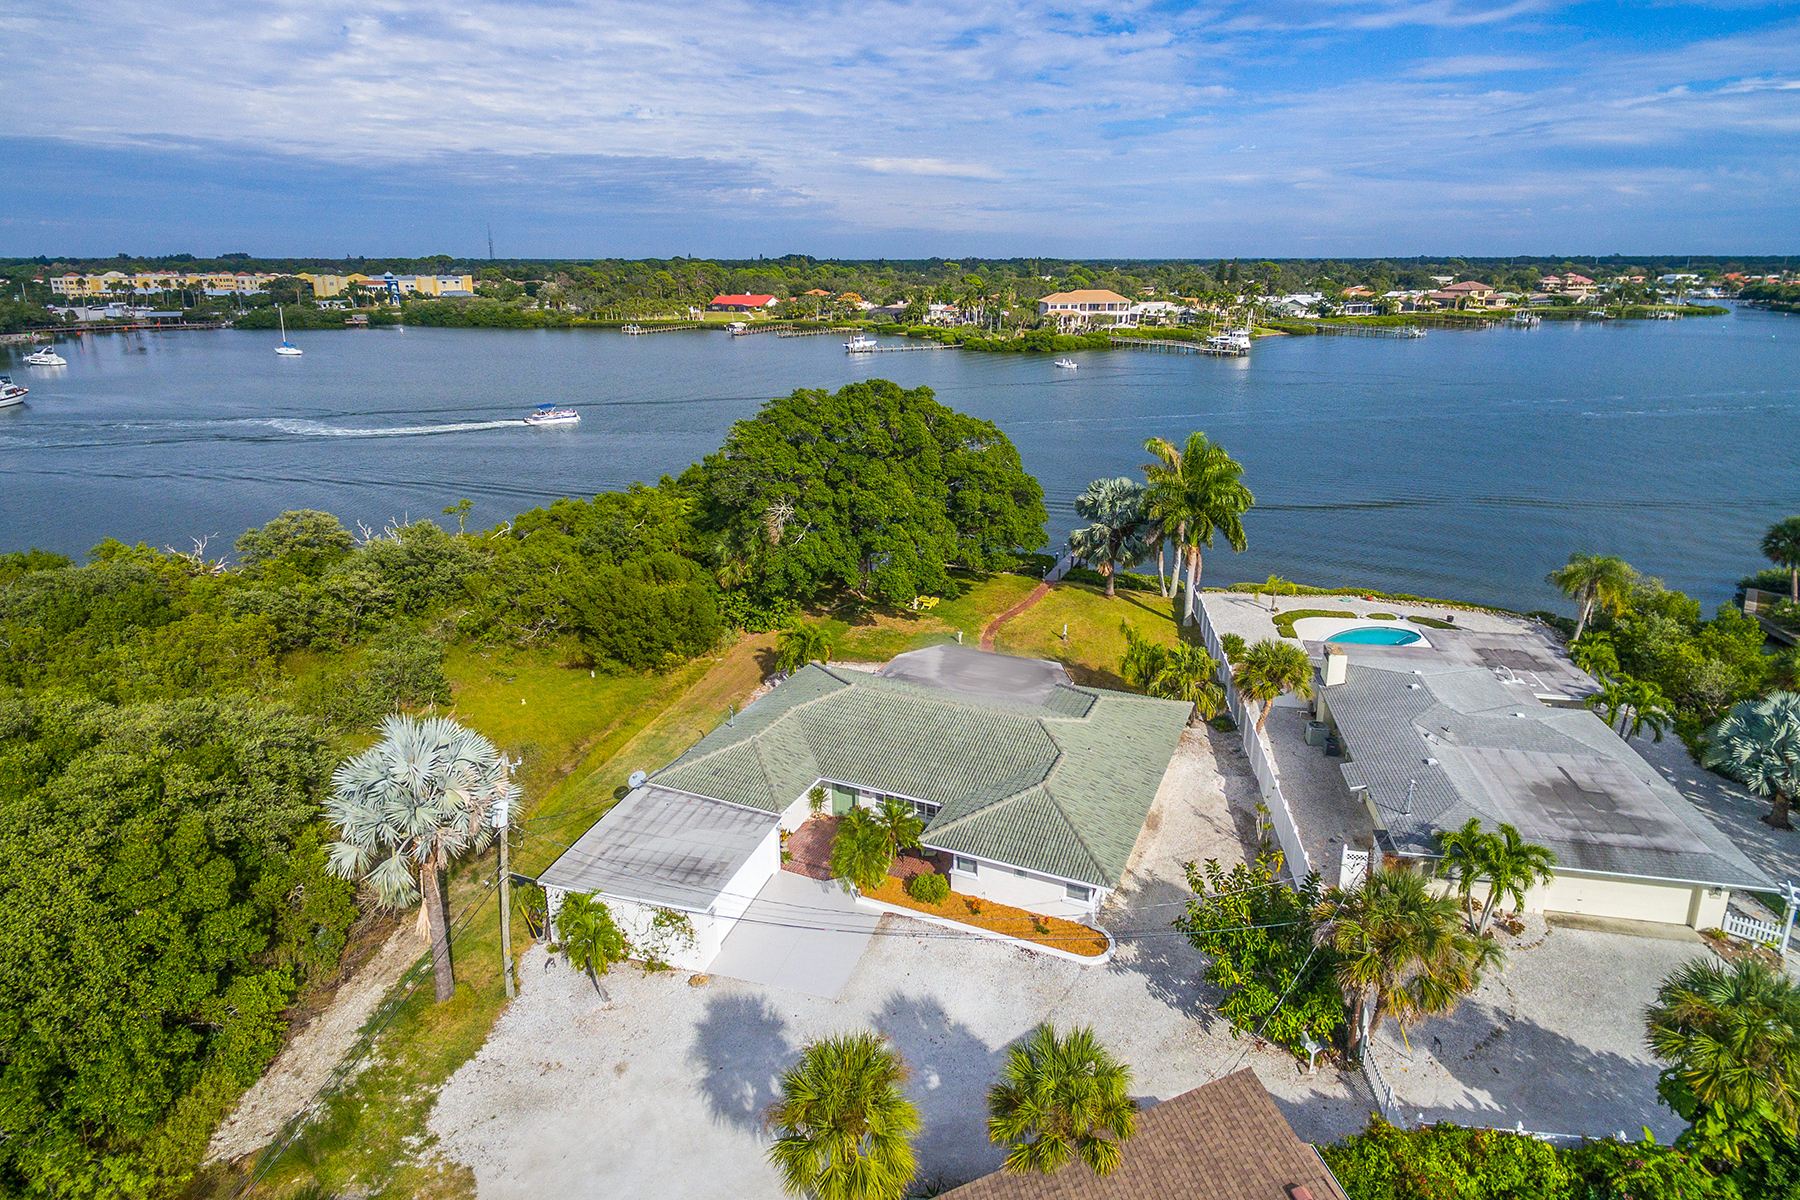 Casa Unifamiliar por un Venta en CASEY KEY 3820 Cutlass Bayou Nokomis, Florida, 34275 Estados Unidos